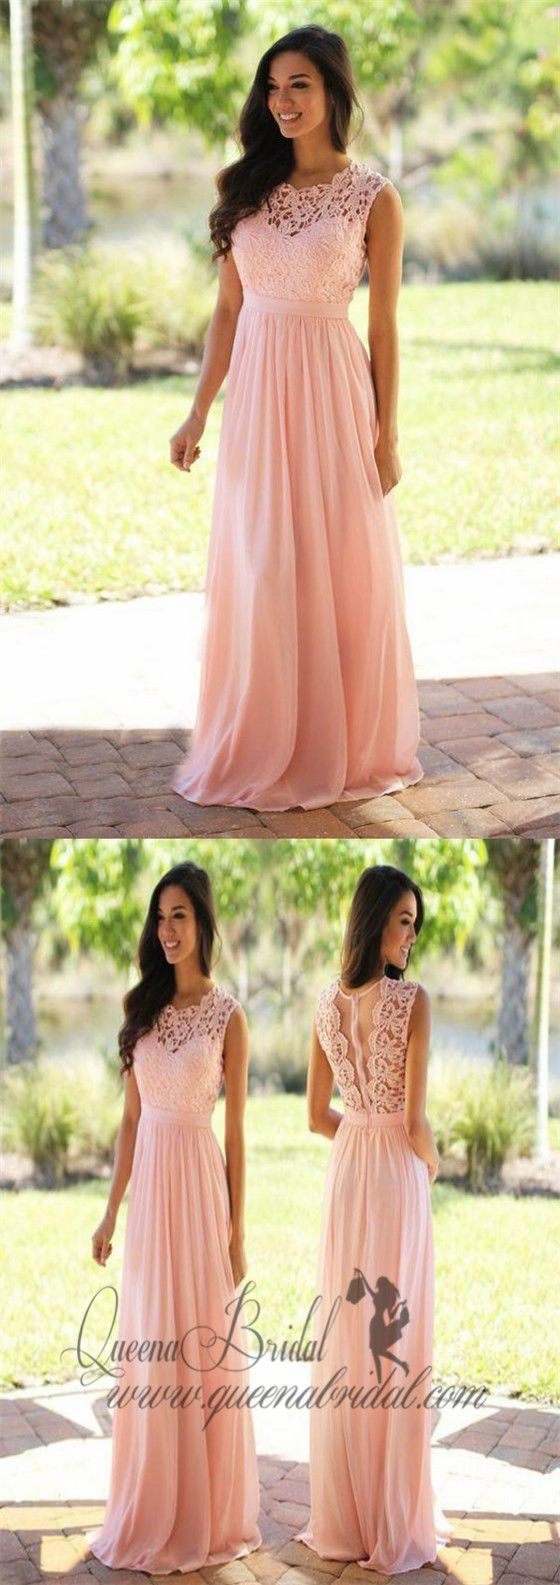 Elegant Lace Floor-Length Applique Blush Pink Long Formal Cheap Chiffon Bridesmaid Dresses, WG35 #lacebridesmaids